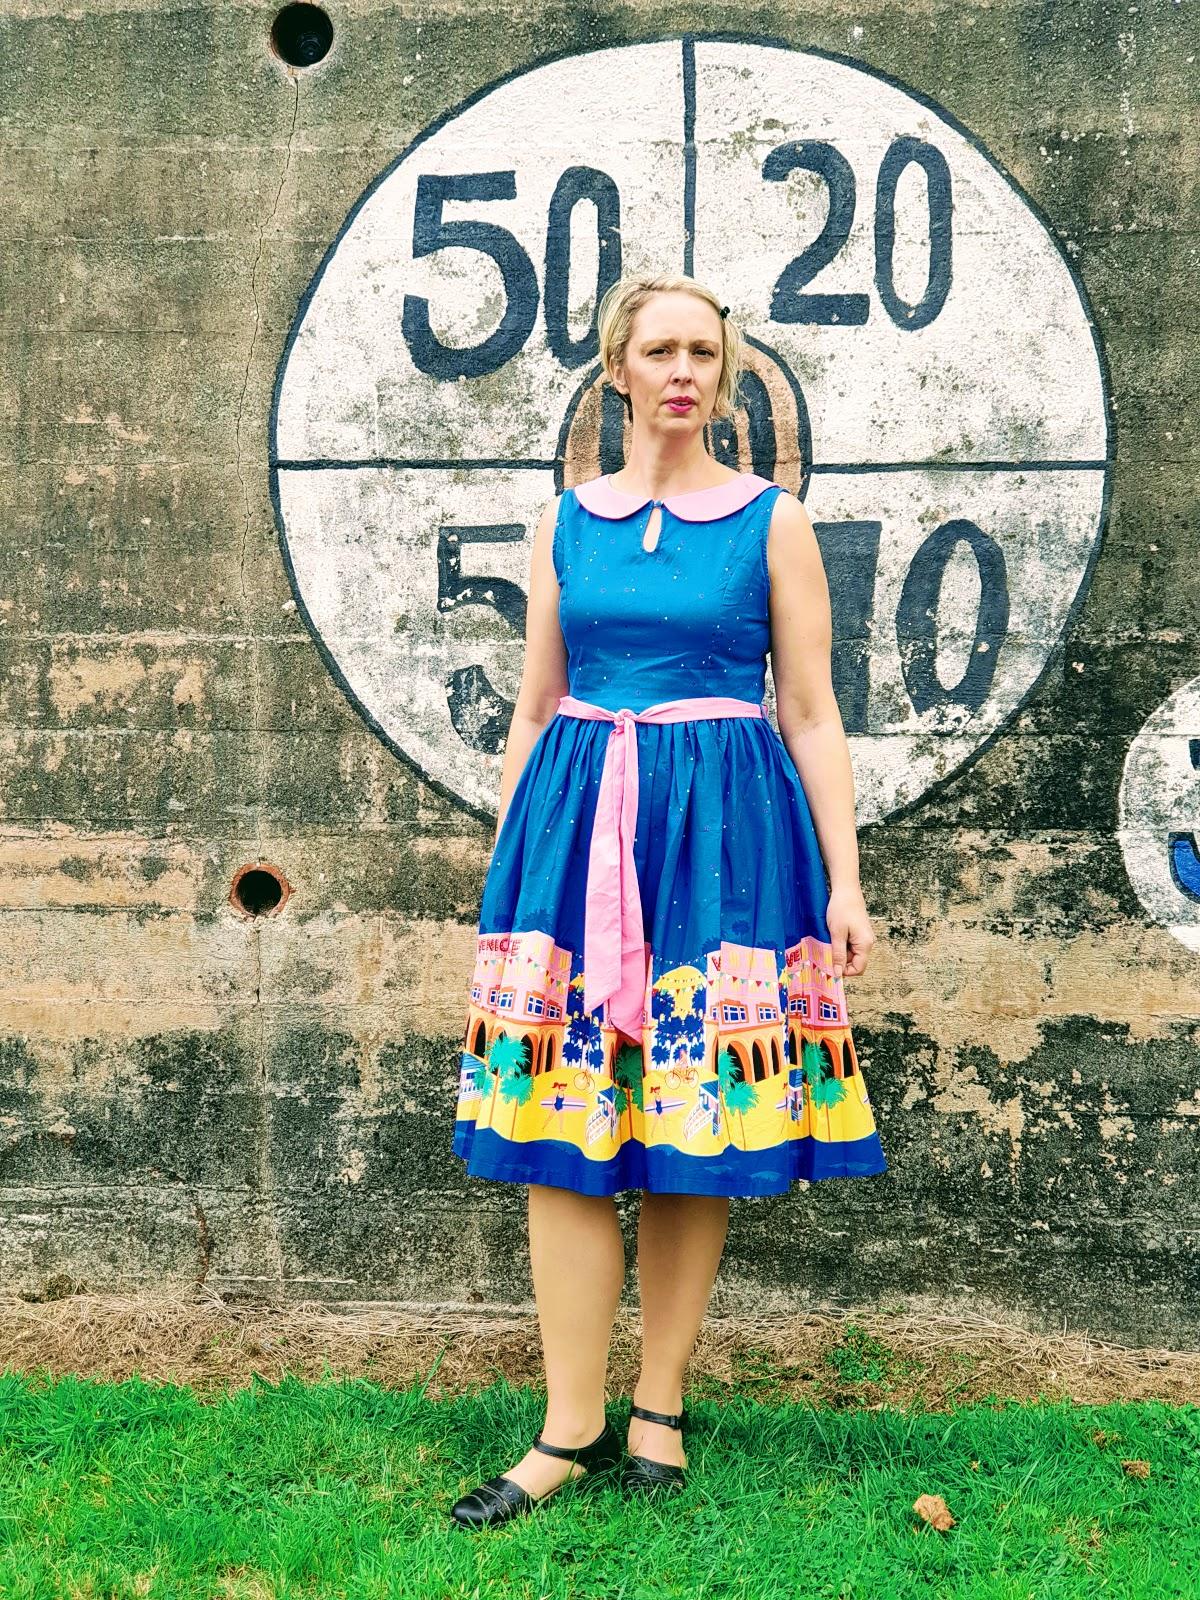 Venice Beach Swing Dress: Over 40 Style: